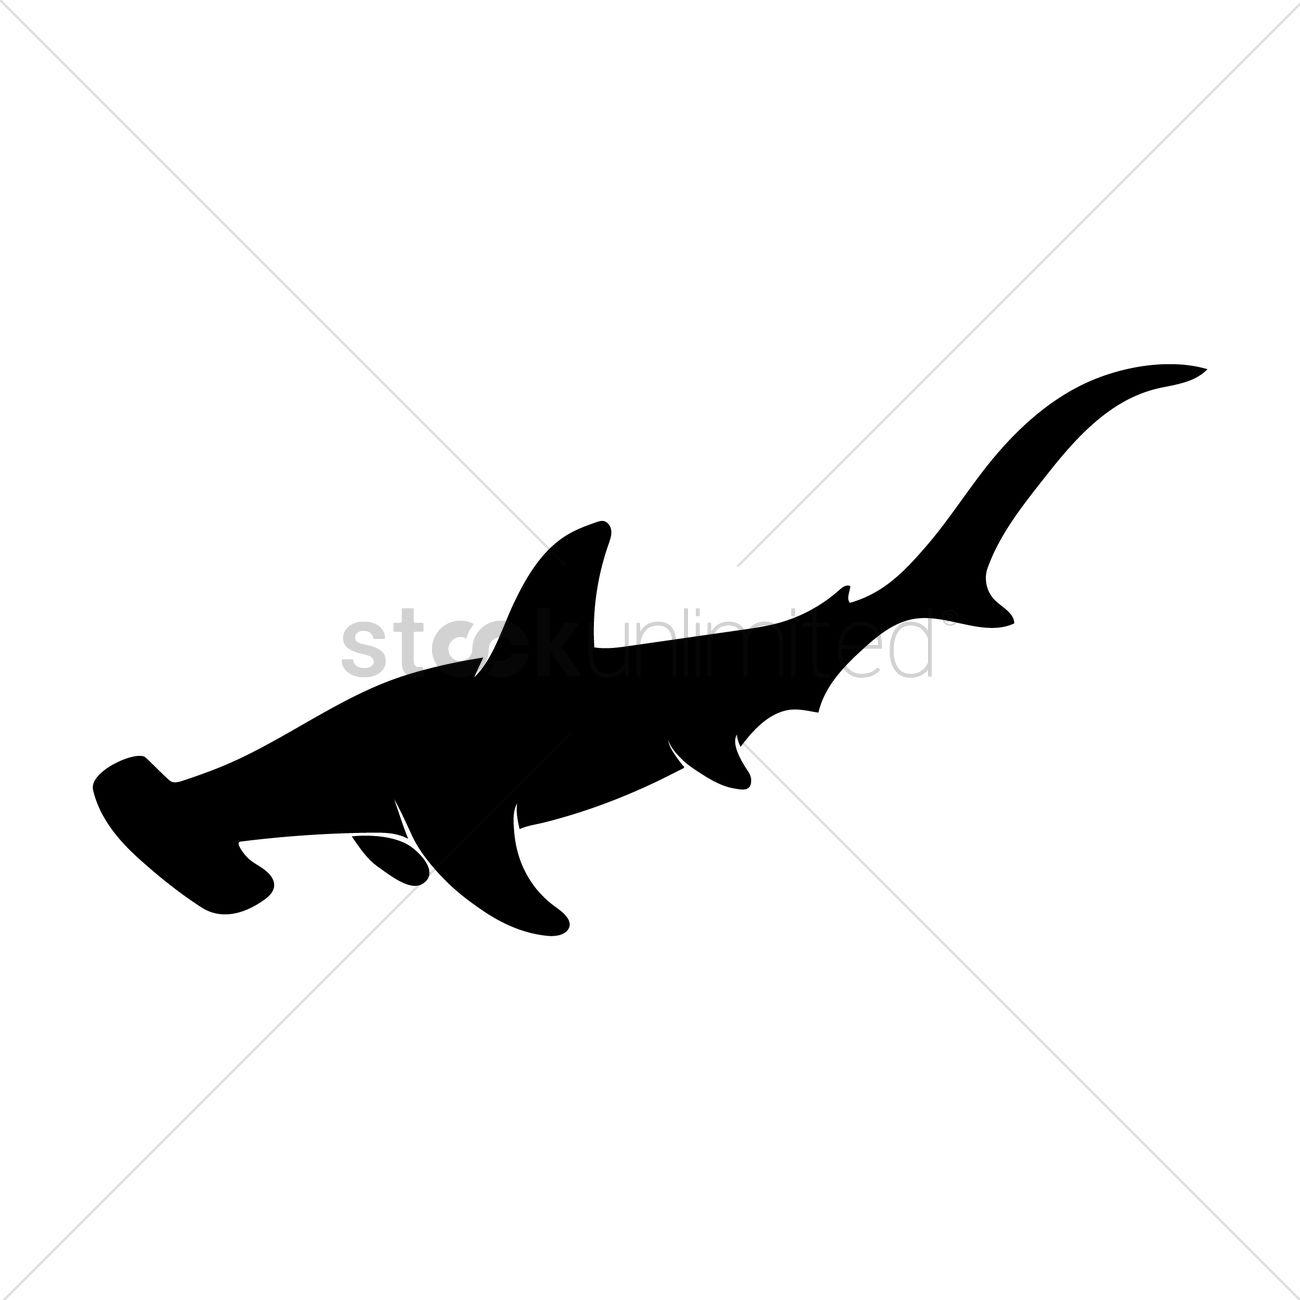 1300x1300 Silhouette Of Hammerhead Shark Vector Image